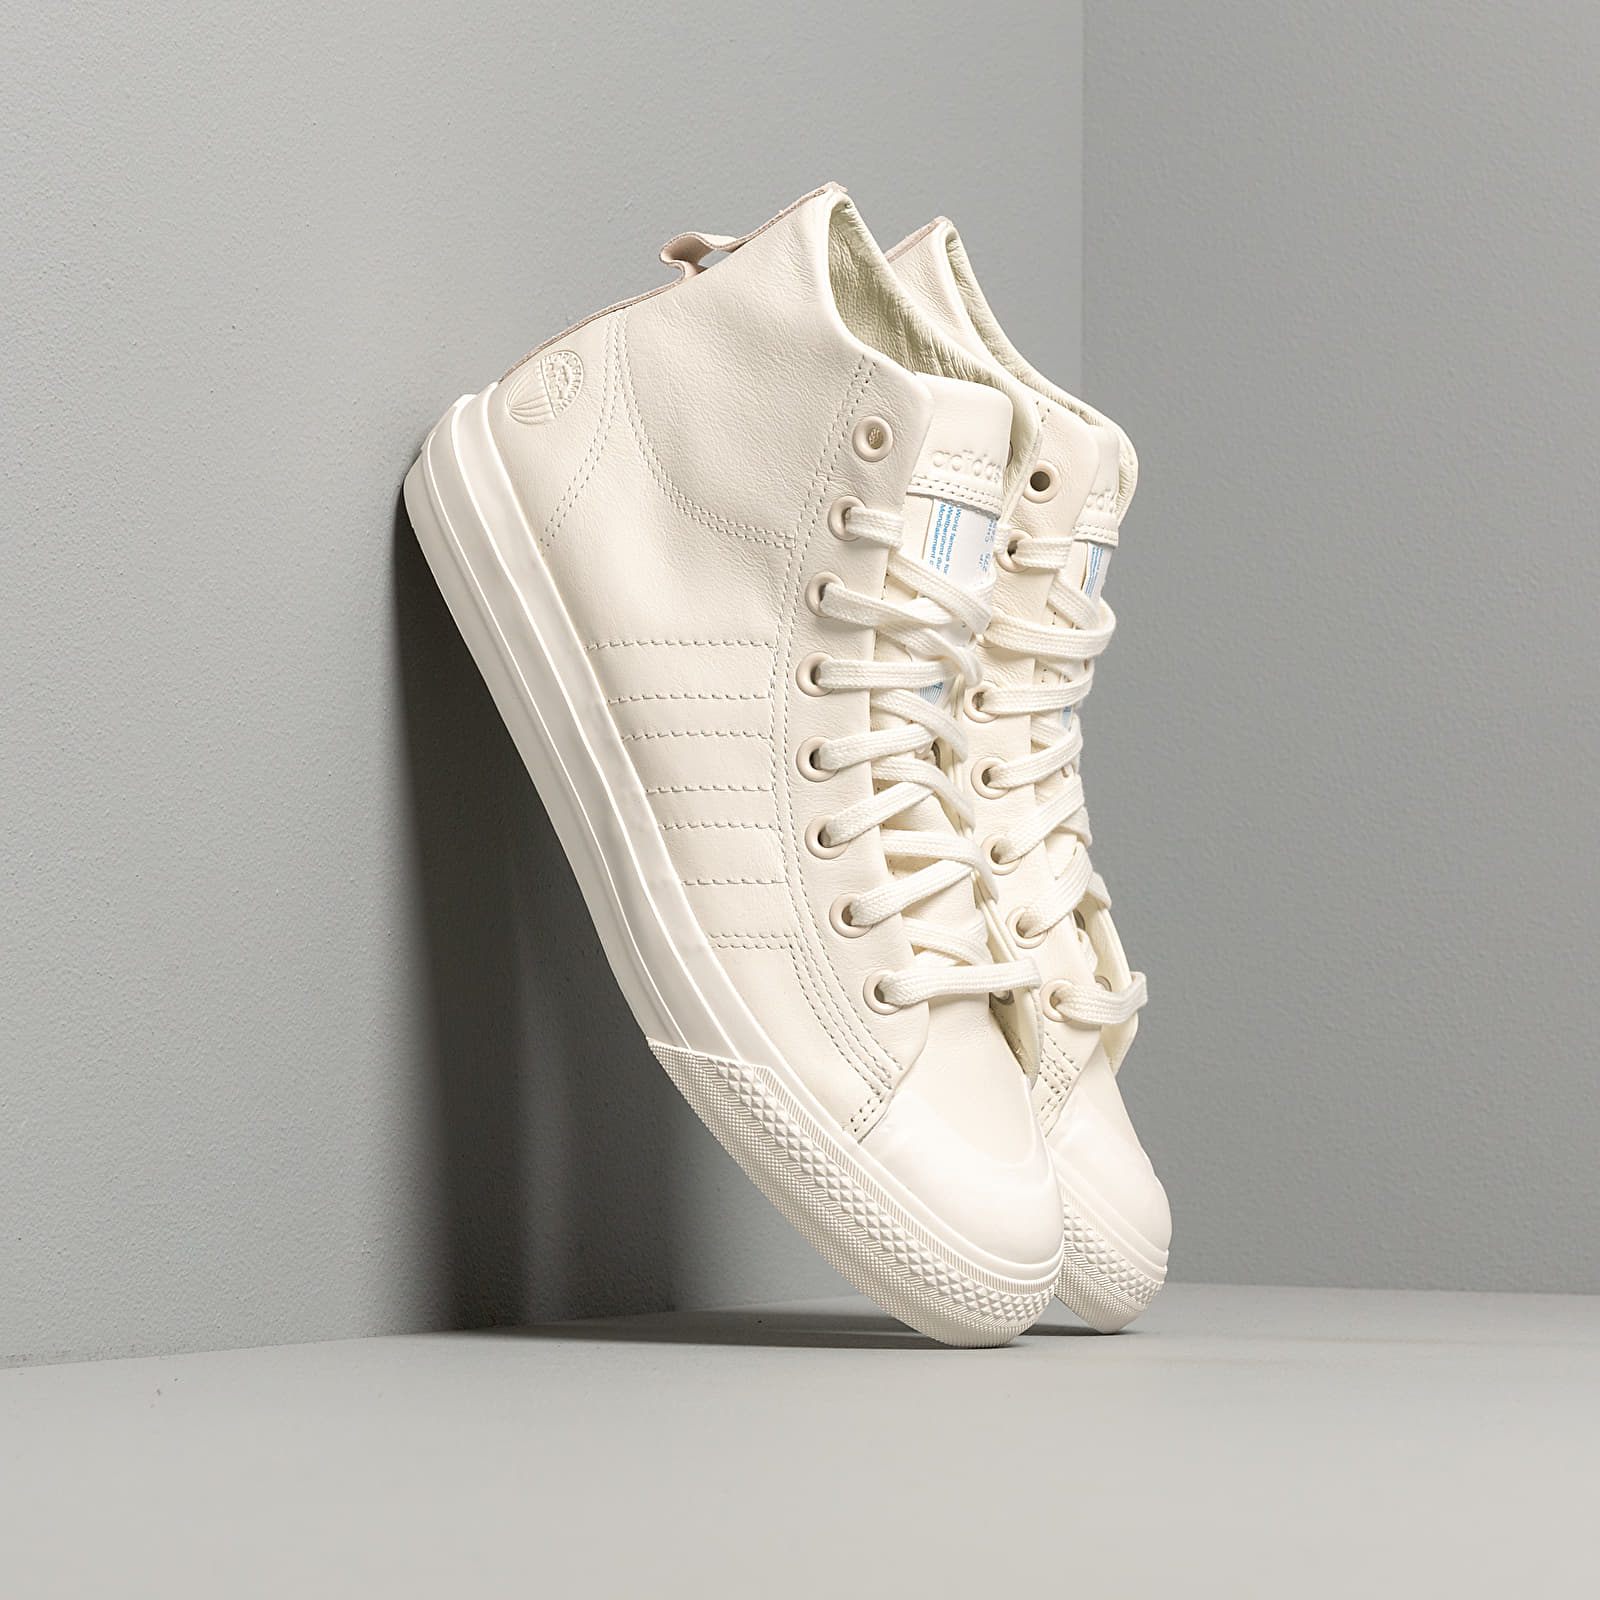 Men's shoes adidas Nizza Hi Rf Off White/ Off White/ Off White